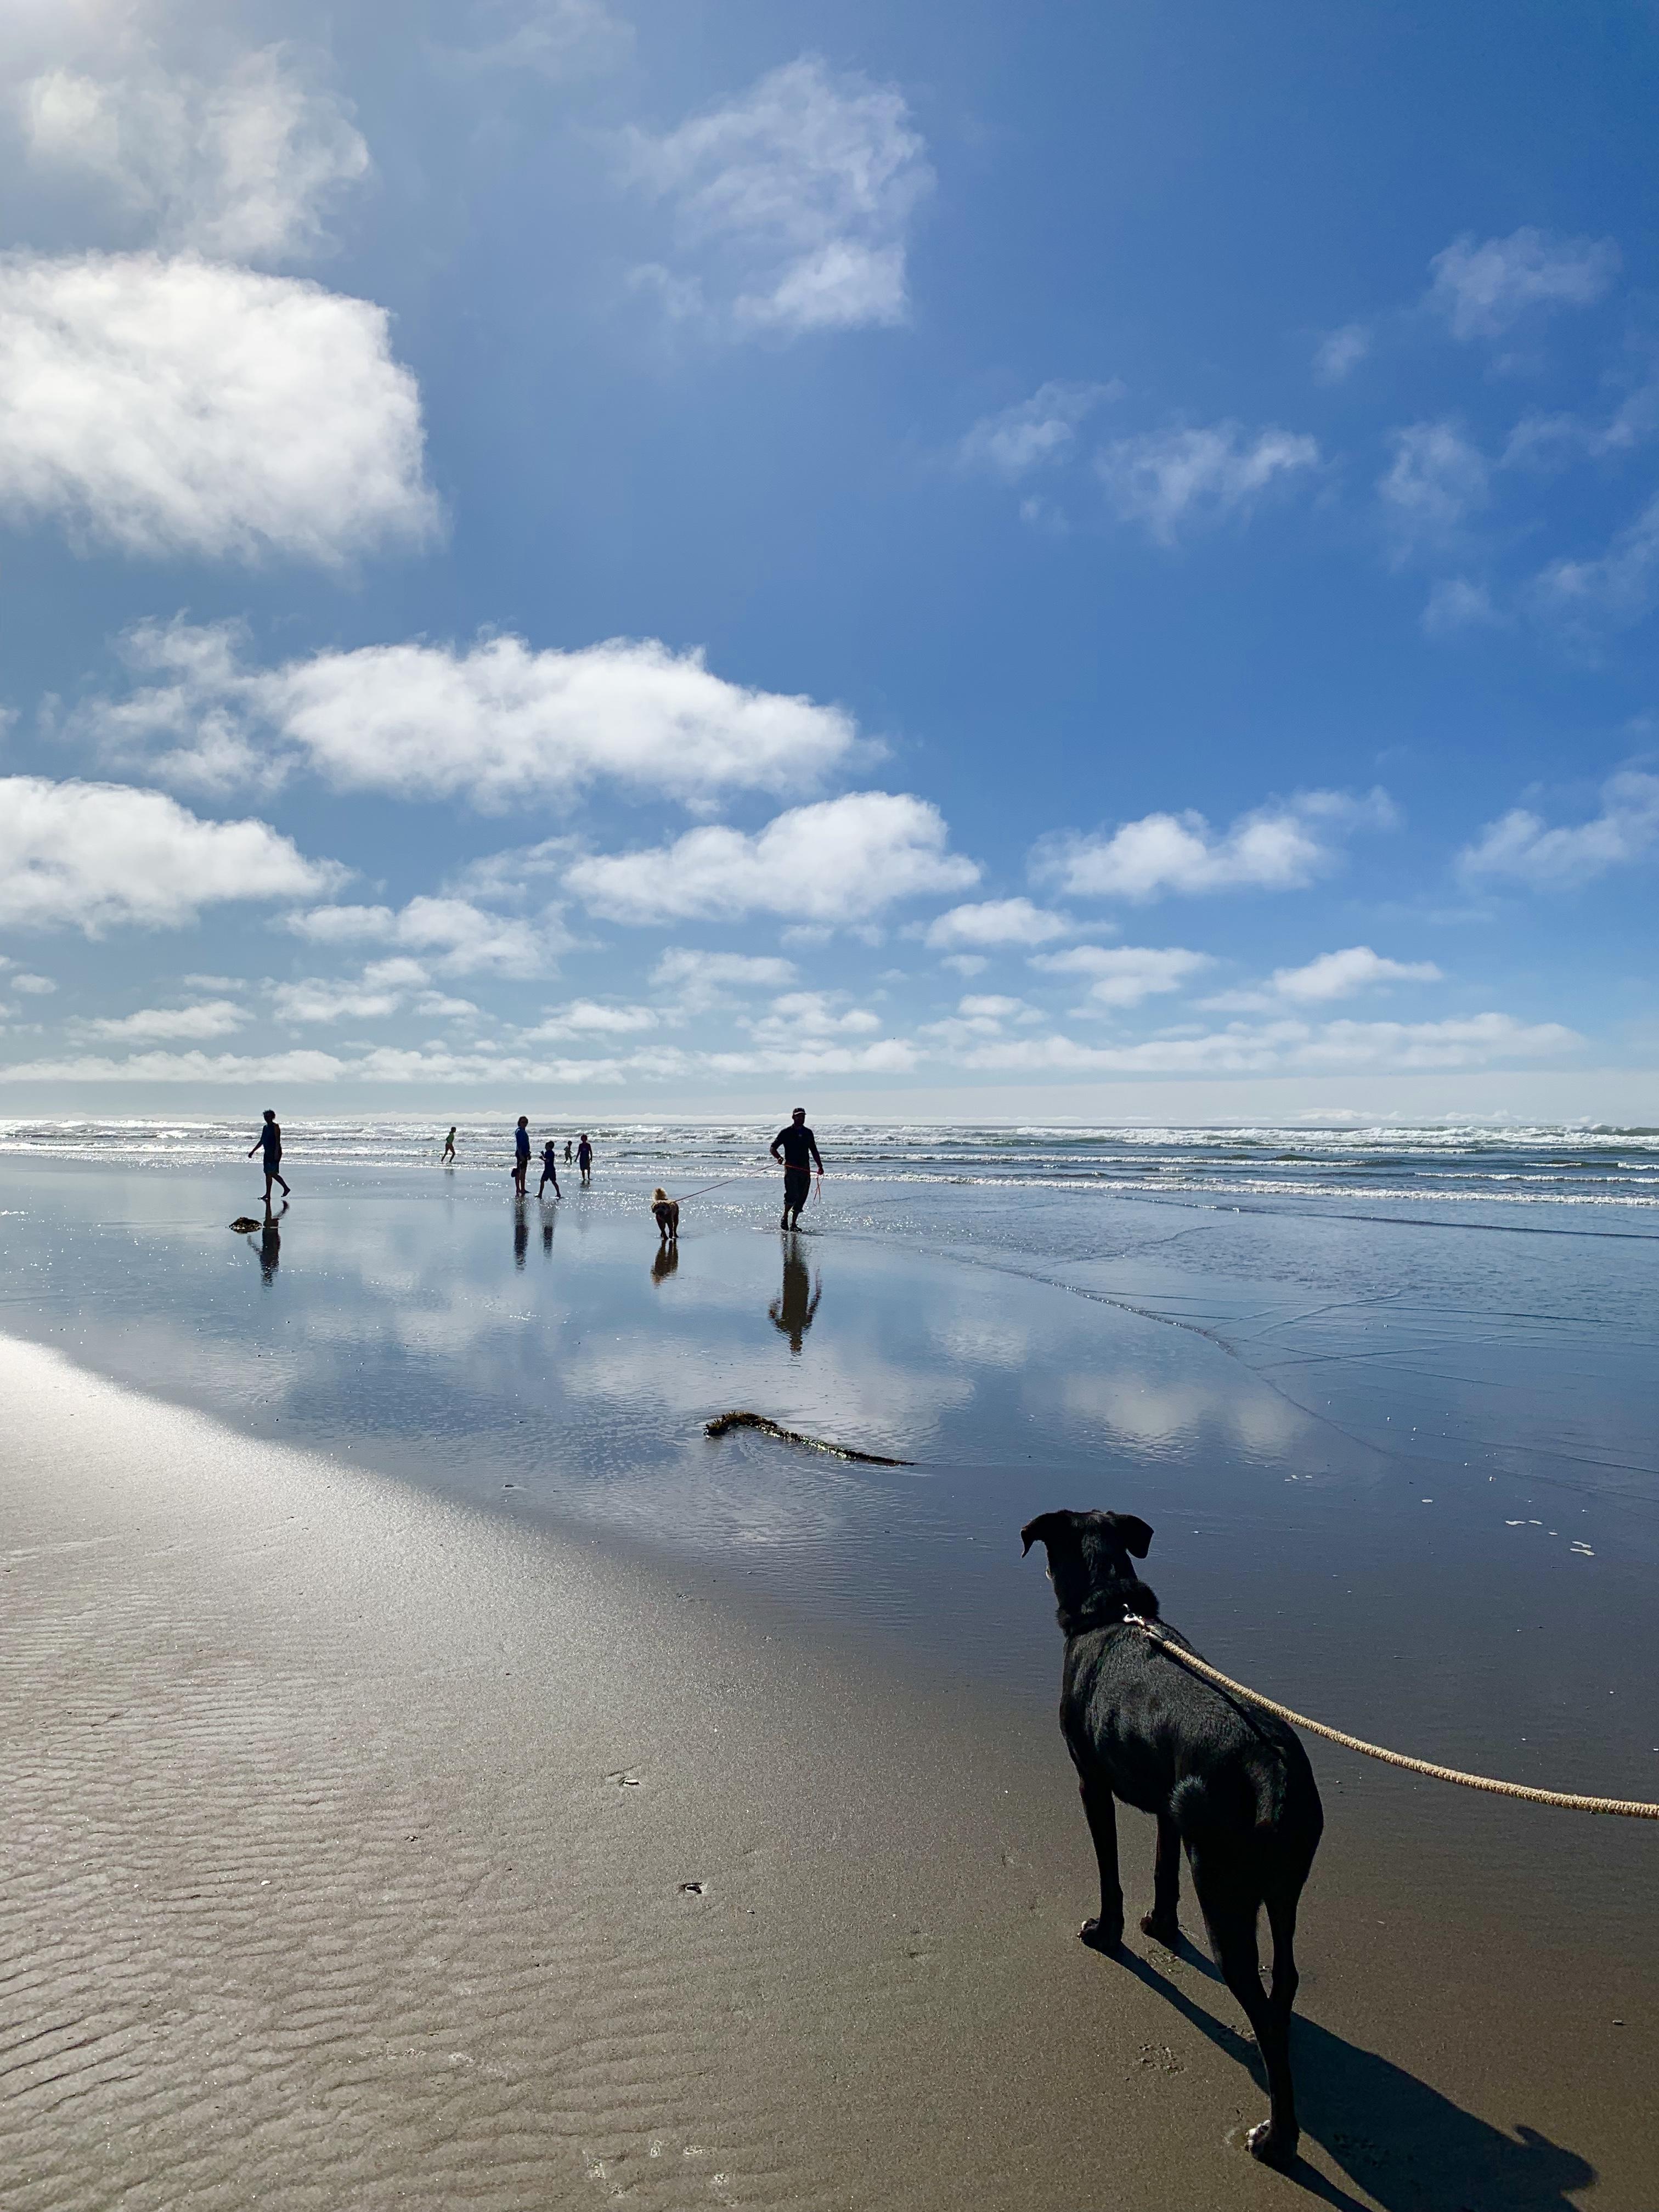 I'd prefer it if life were a beach…